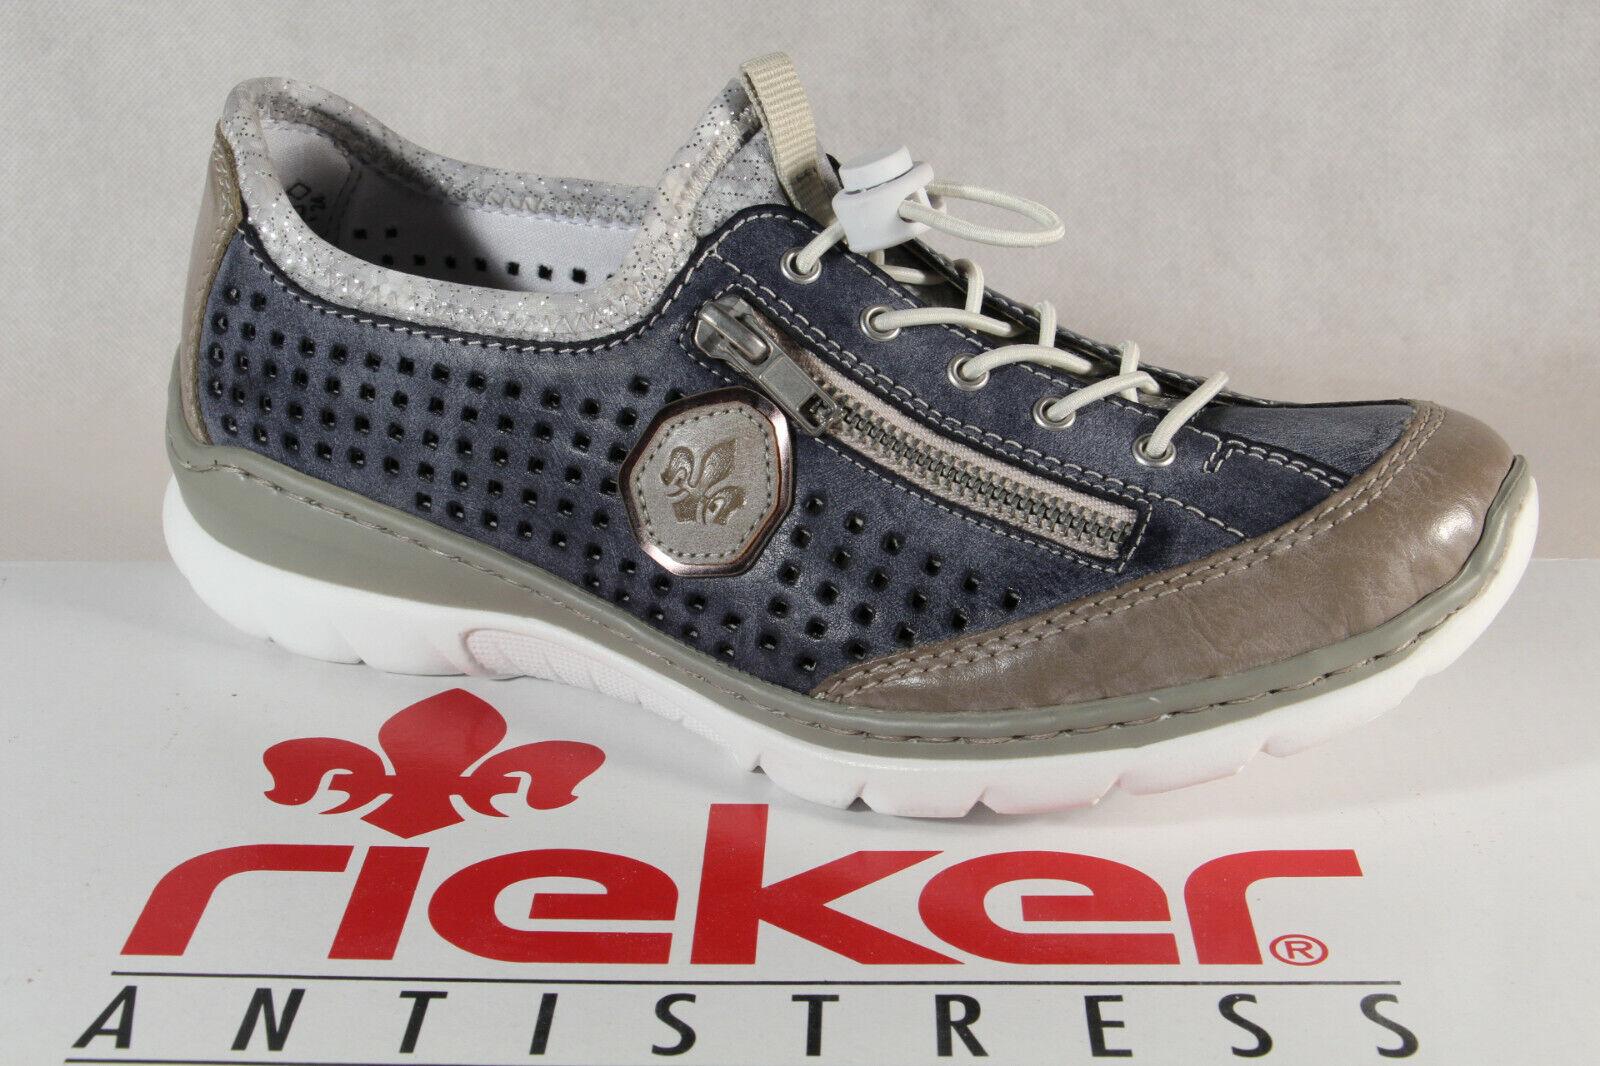 Rieker Slippers scarpe da  ginnastica Low scarpe Trainers Ballerina blu L3296 Memosoft Nuovo  risparmia fino al 50%